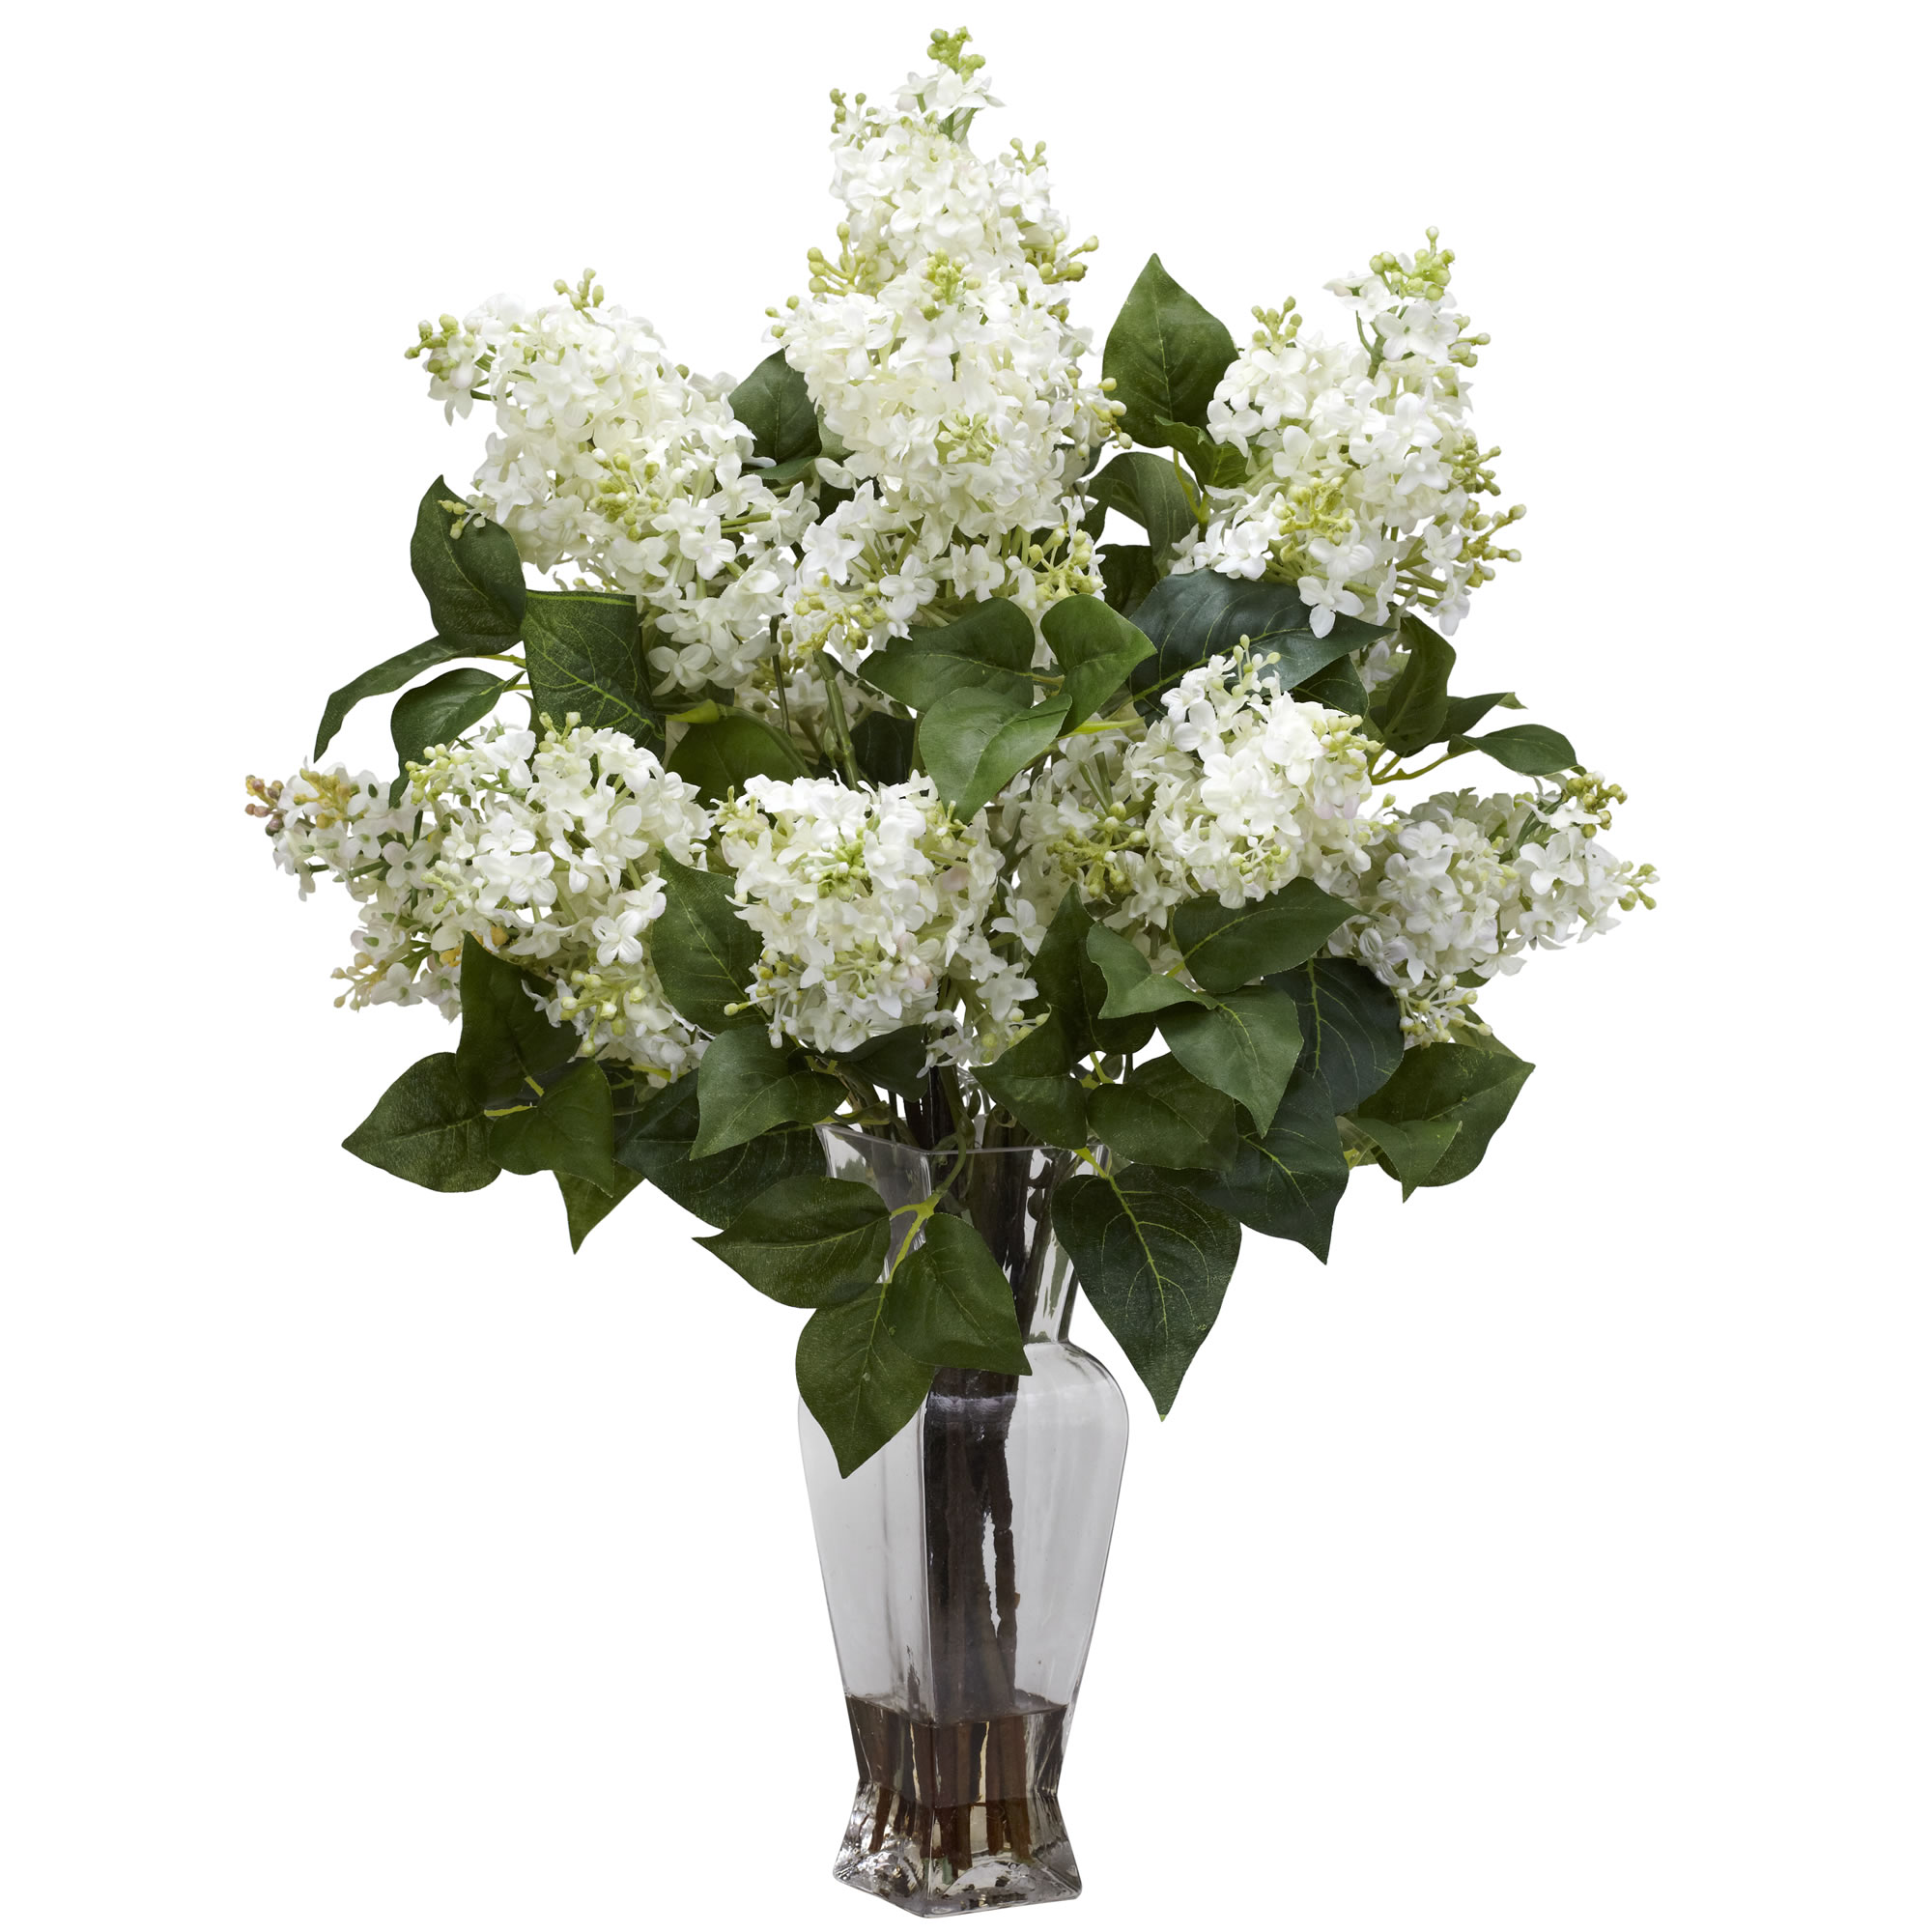 Details About Artificial 24 Lilac Silk Flowers Floral Arrangement In Faux Water Glass Vase